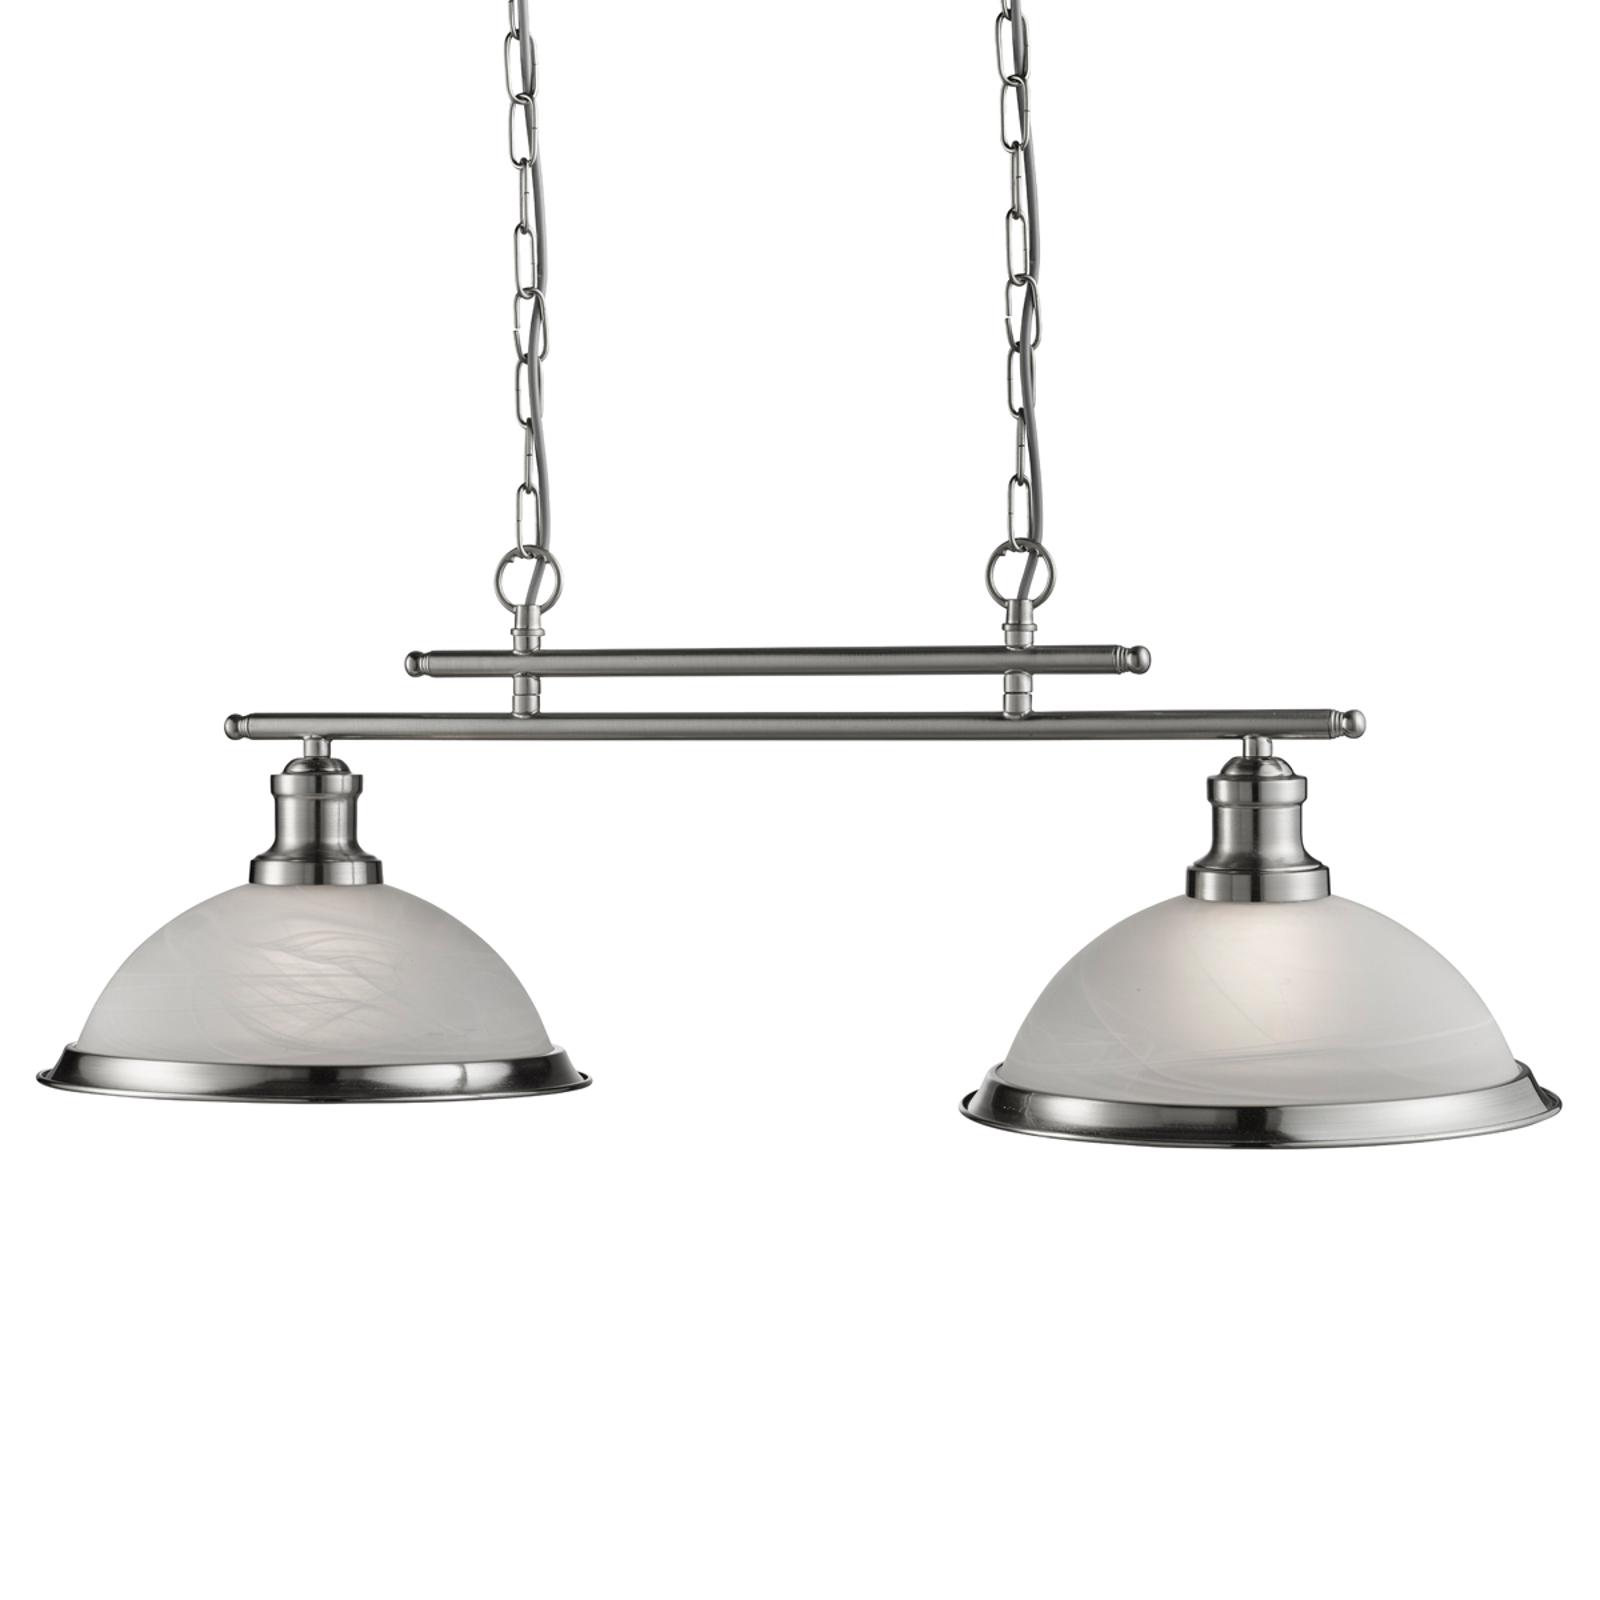 Elegant Bistro hanging light with 2 bulbs, antique_8570915_1